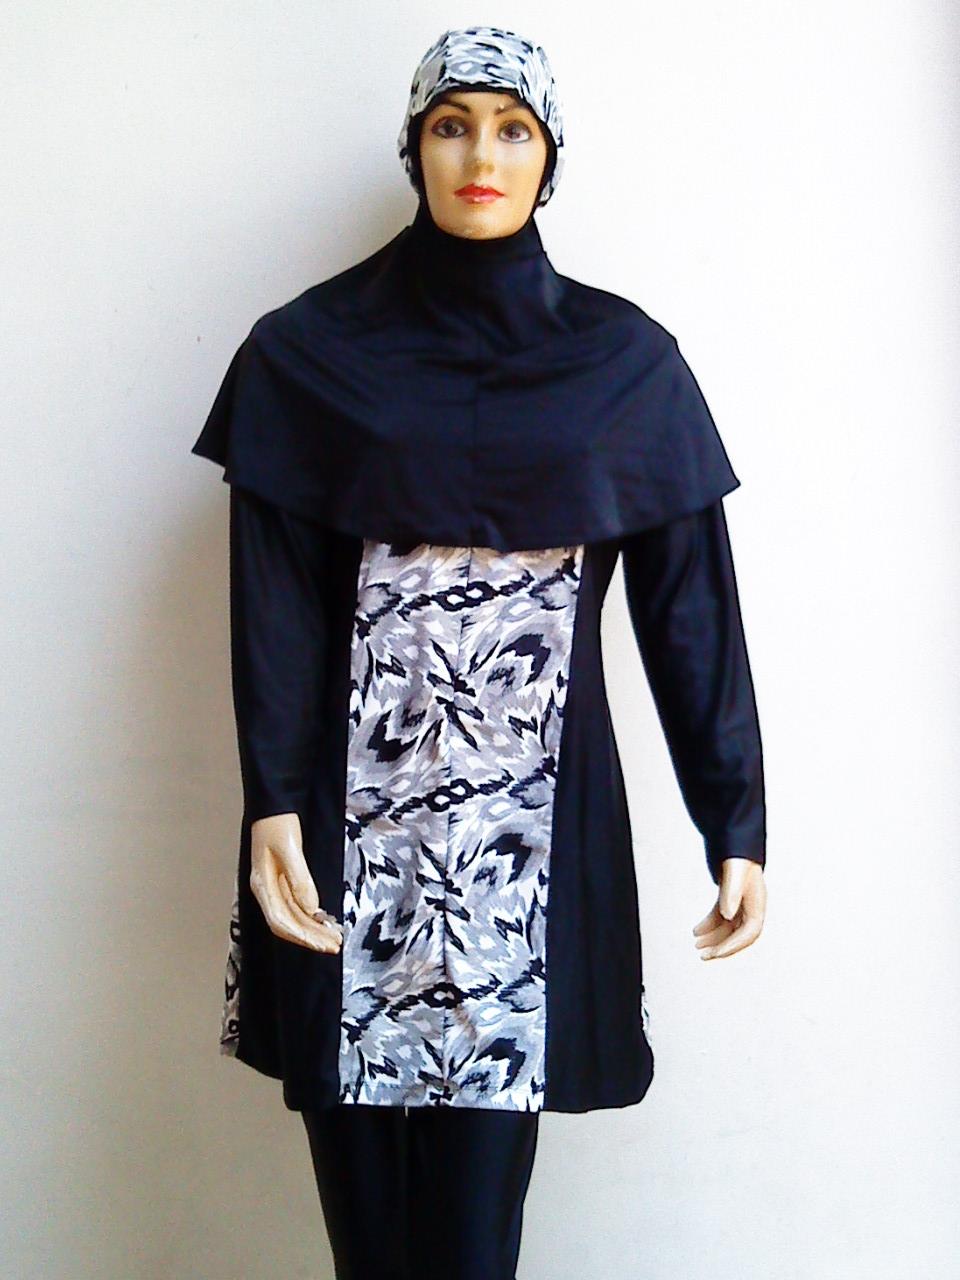 Anugrah Busana Muslim Baju Renang Muslimah Kode 1110008